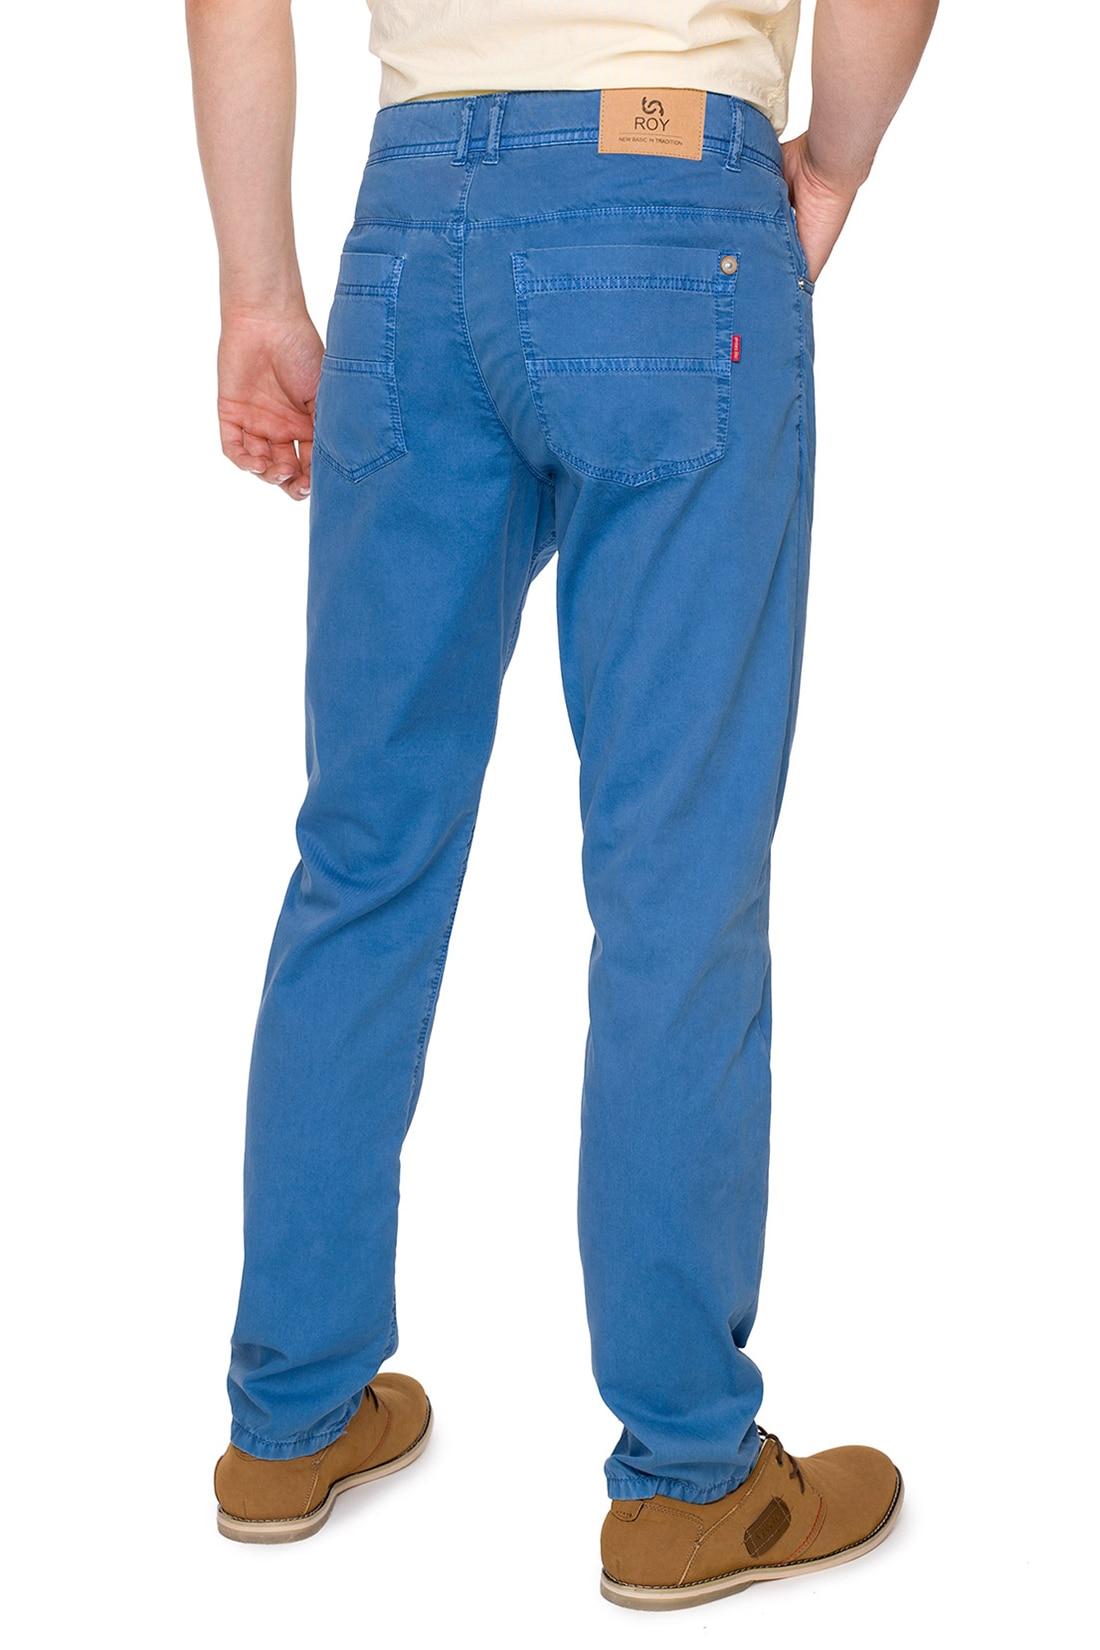 férfi ülepes nadrág ombre